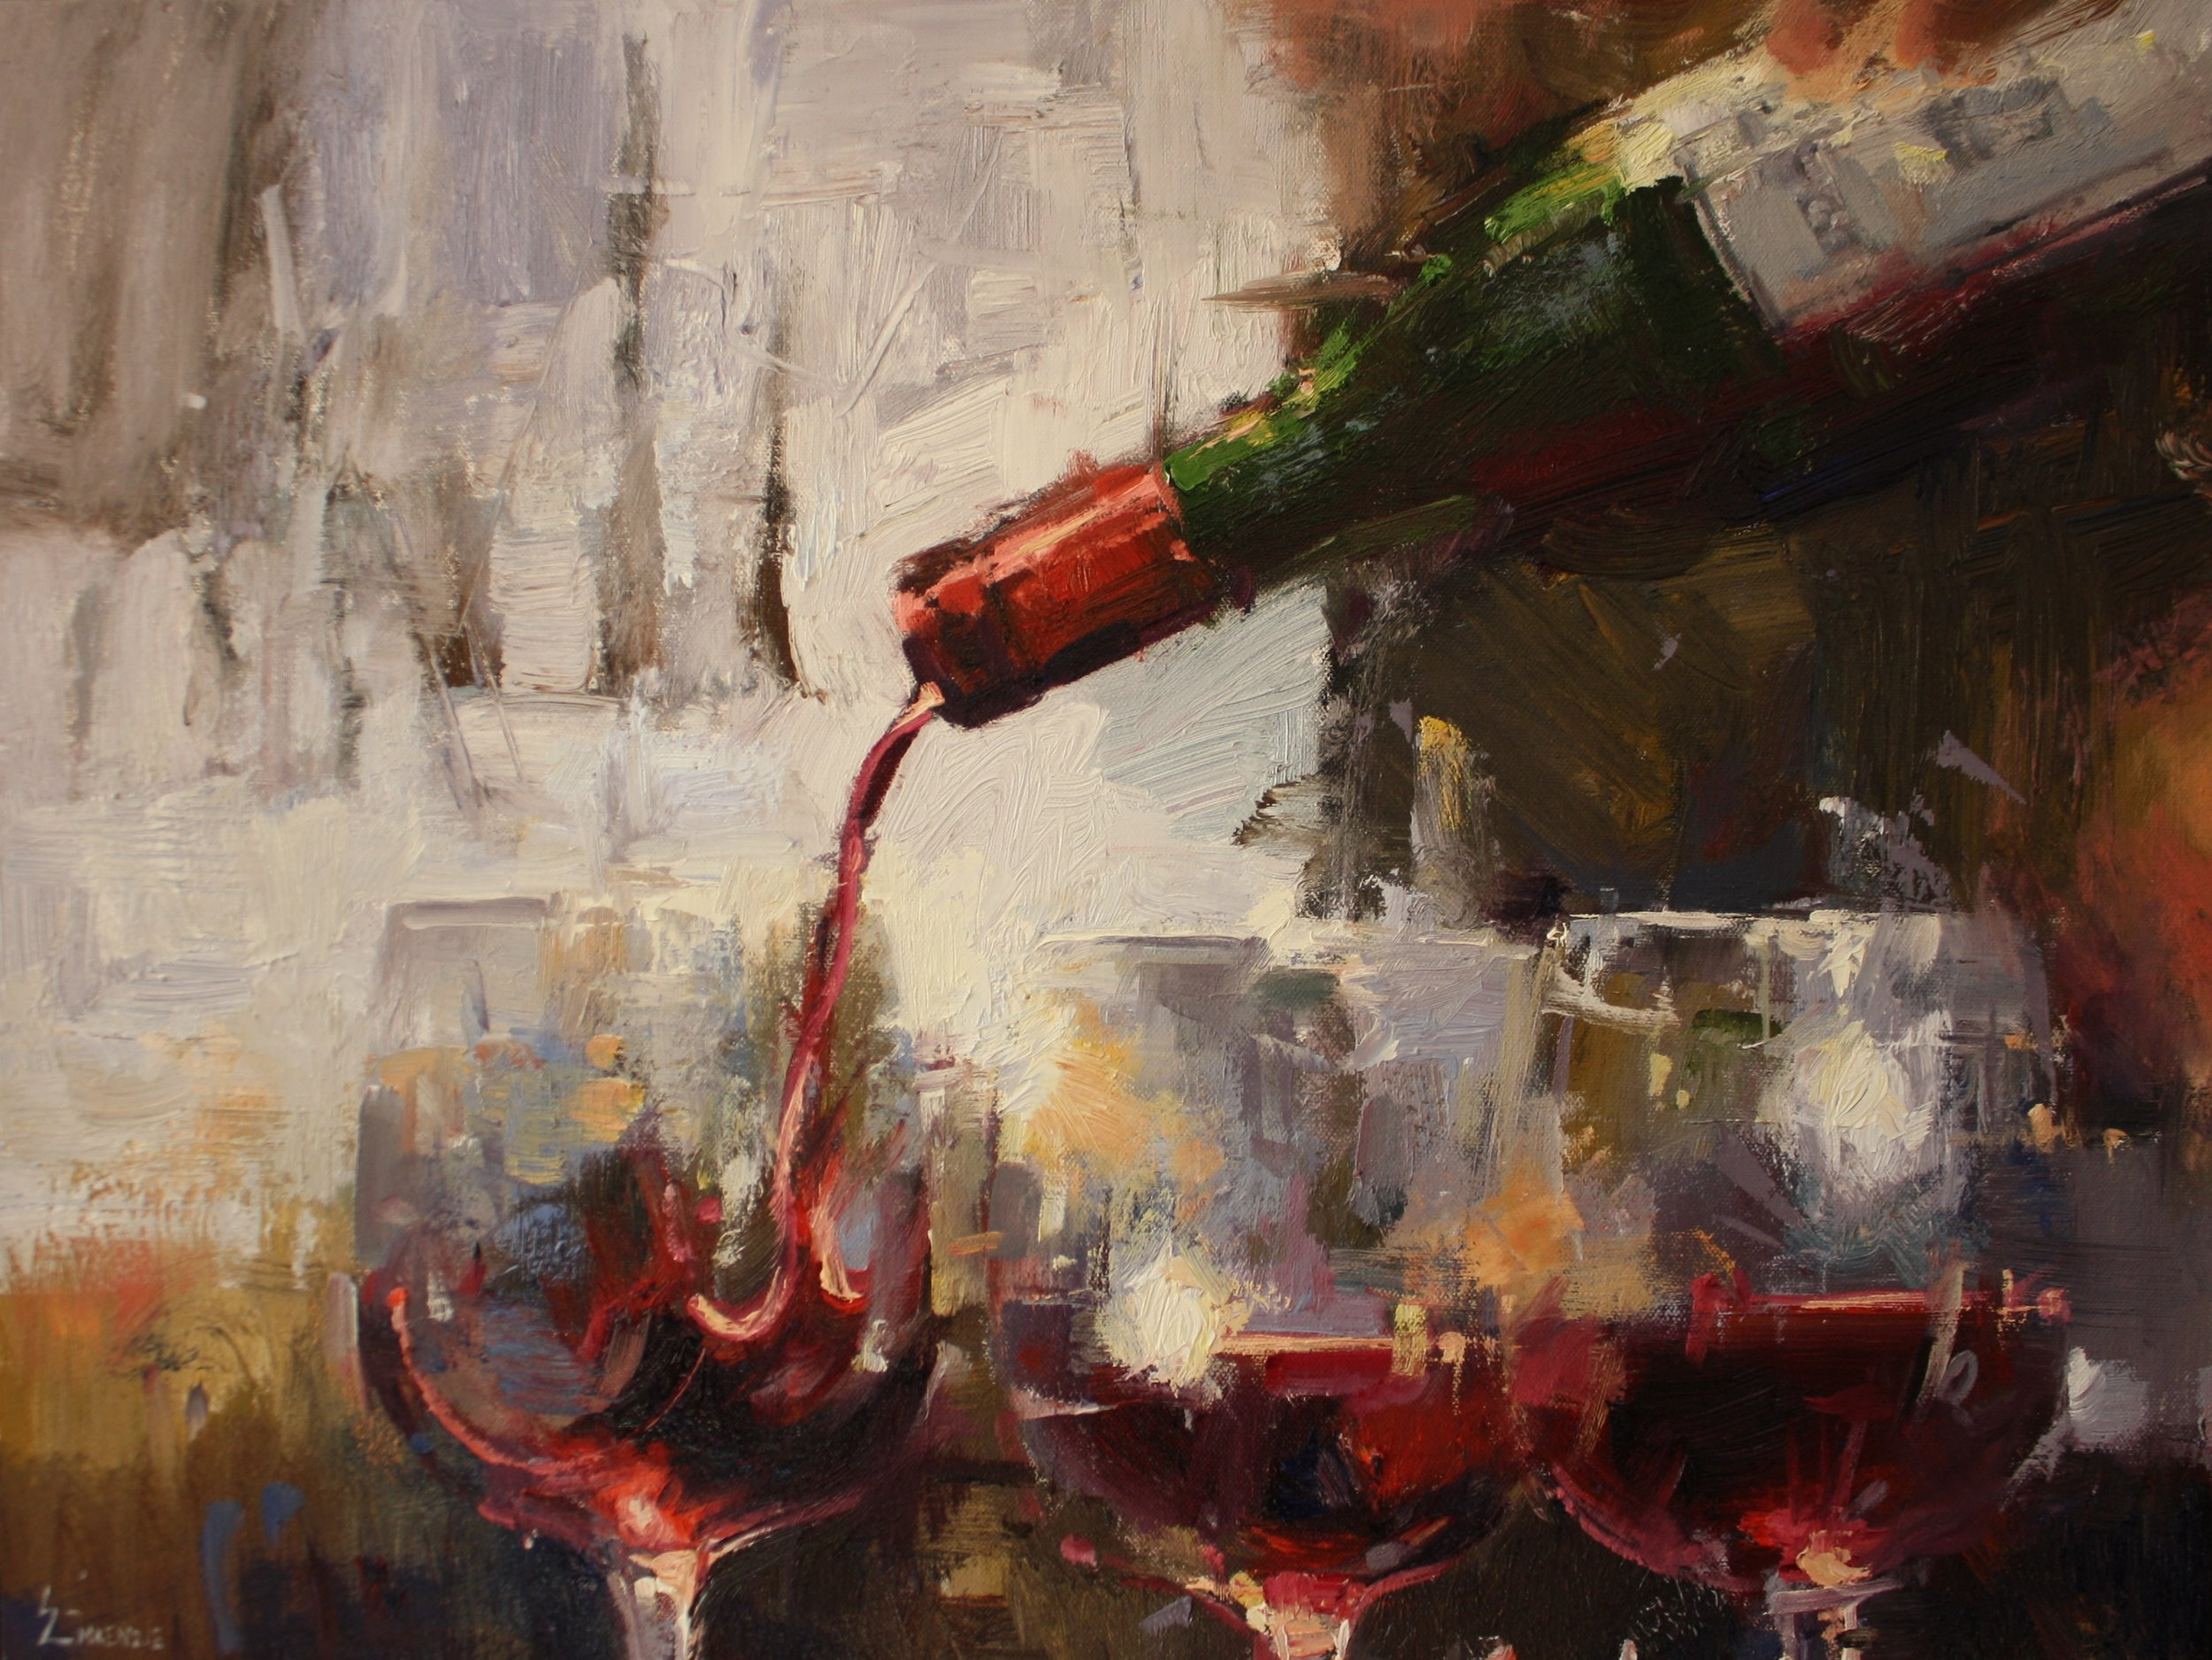 """Aspens and Wine"" 16x20, $1800.."